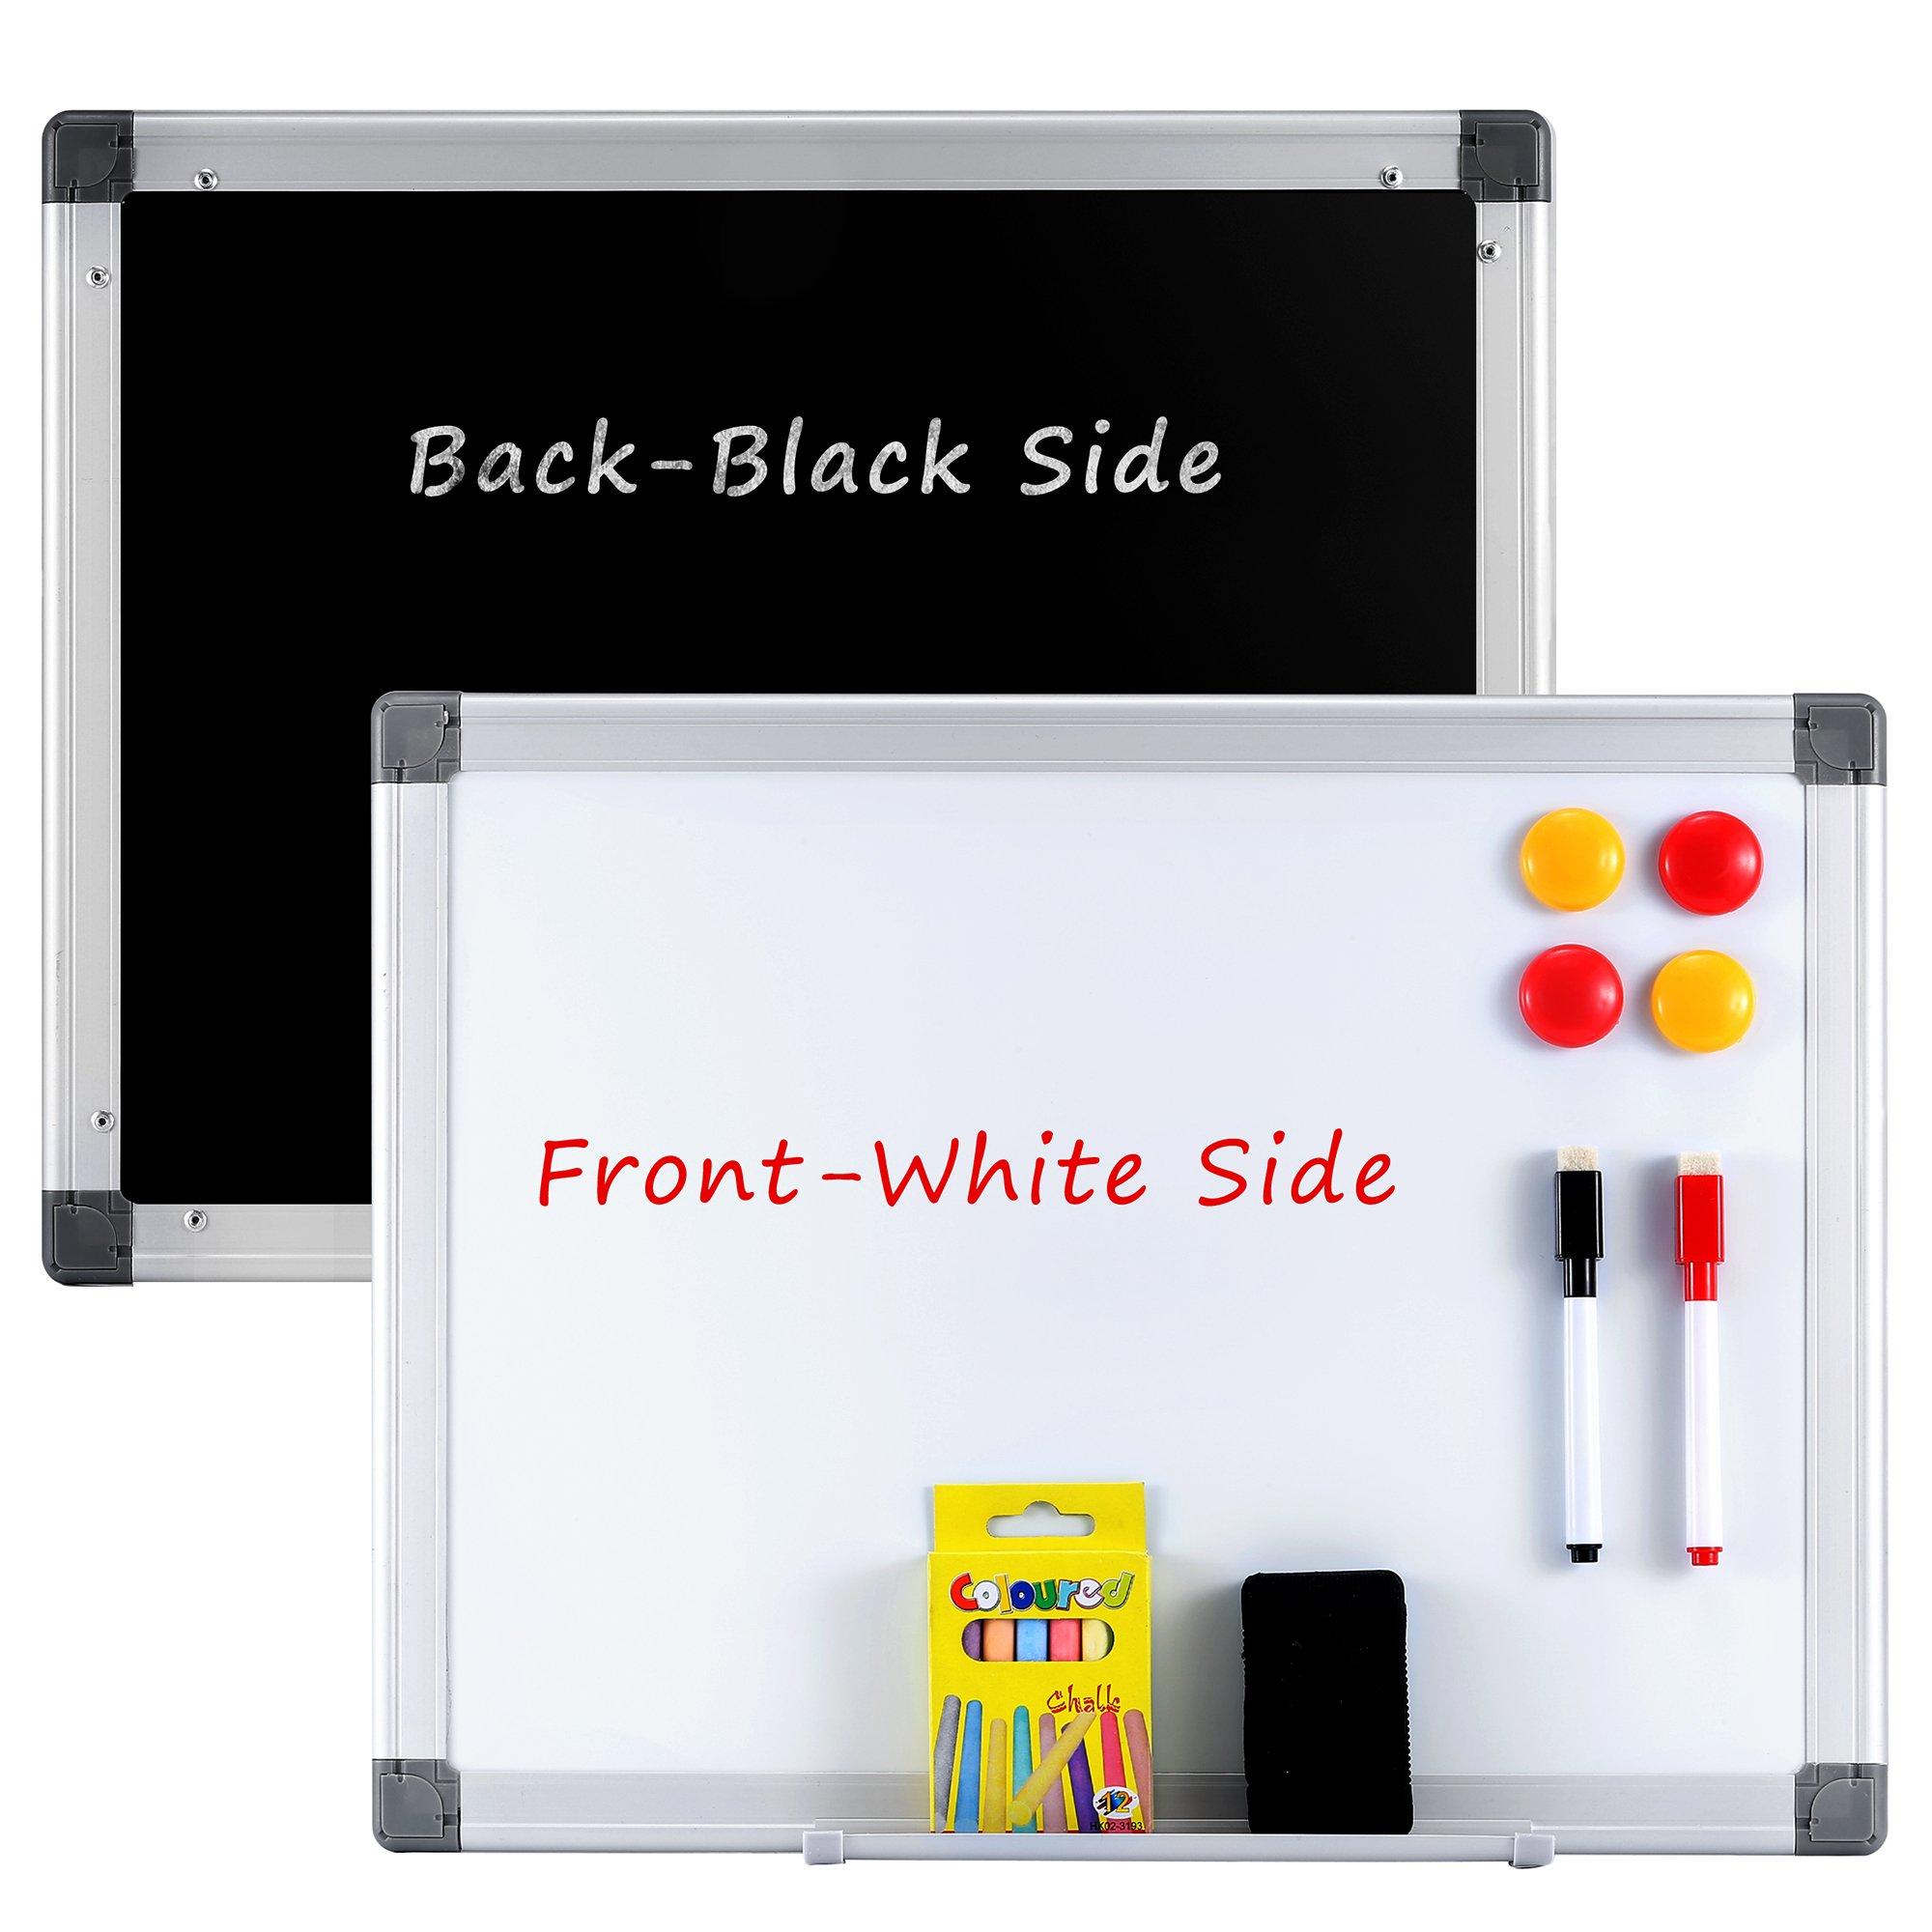 Famistar Double Side-Black+White Board Set 12.3''x 16.2'' Dry Erase Wall WhiteBoard Chalkboard Hanging Message Scoreboard For Home Kitchen Office School,Horizontal or Landscape